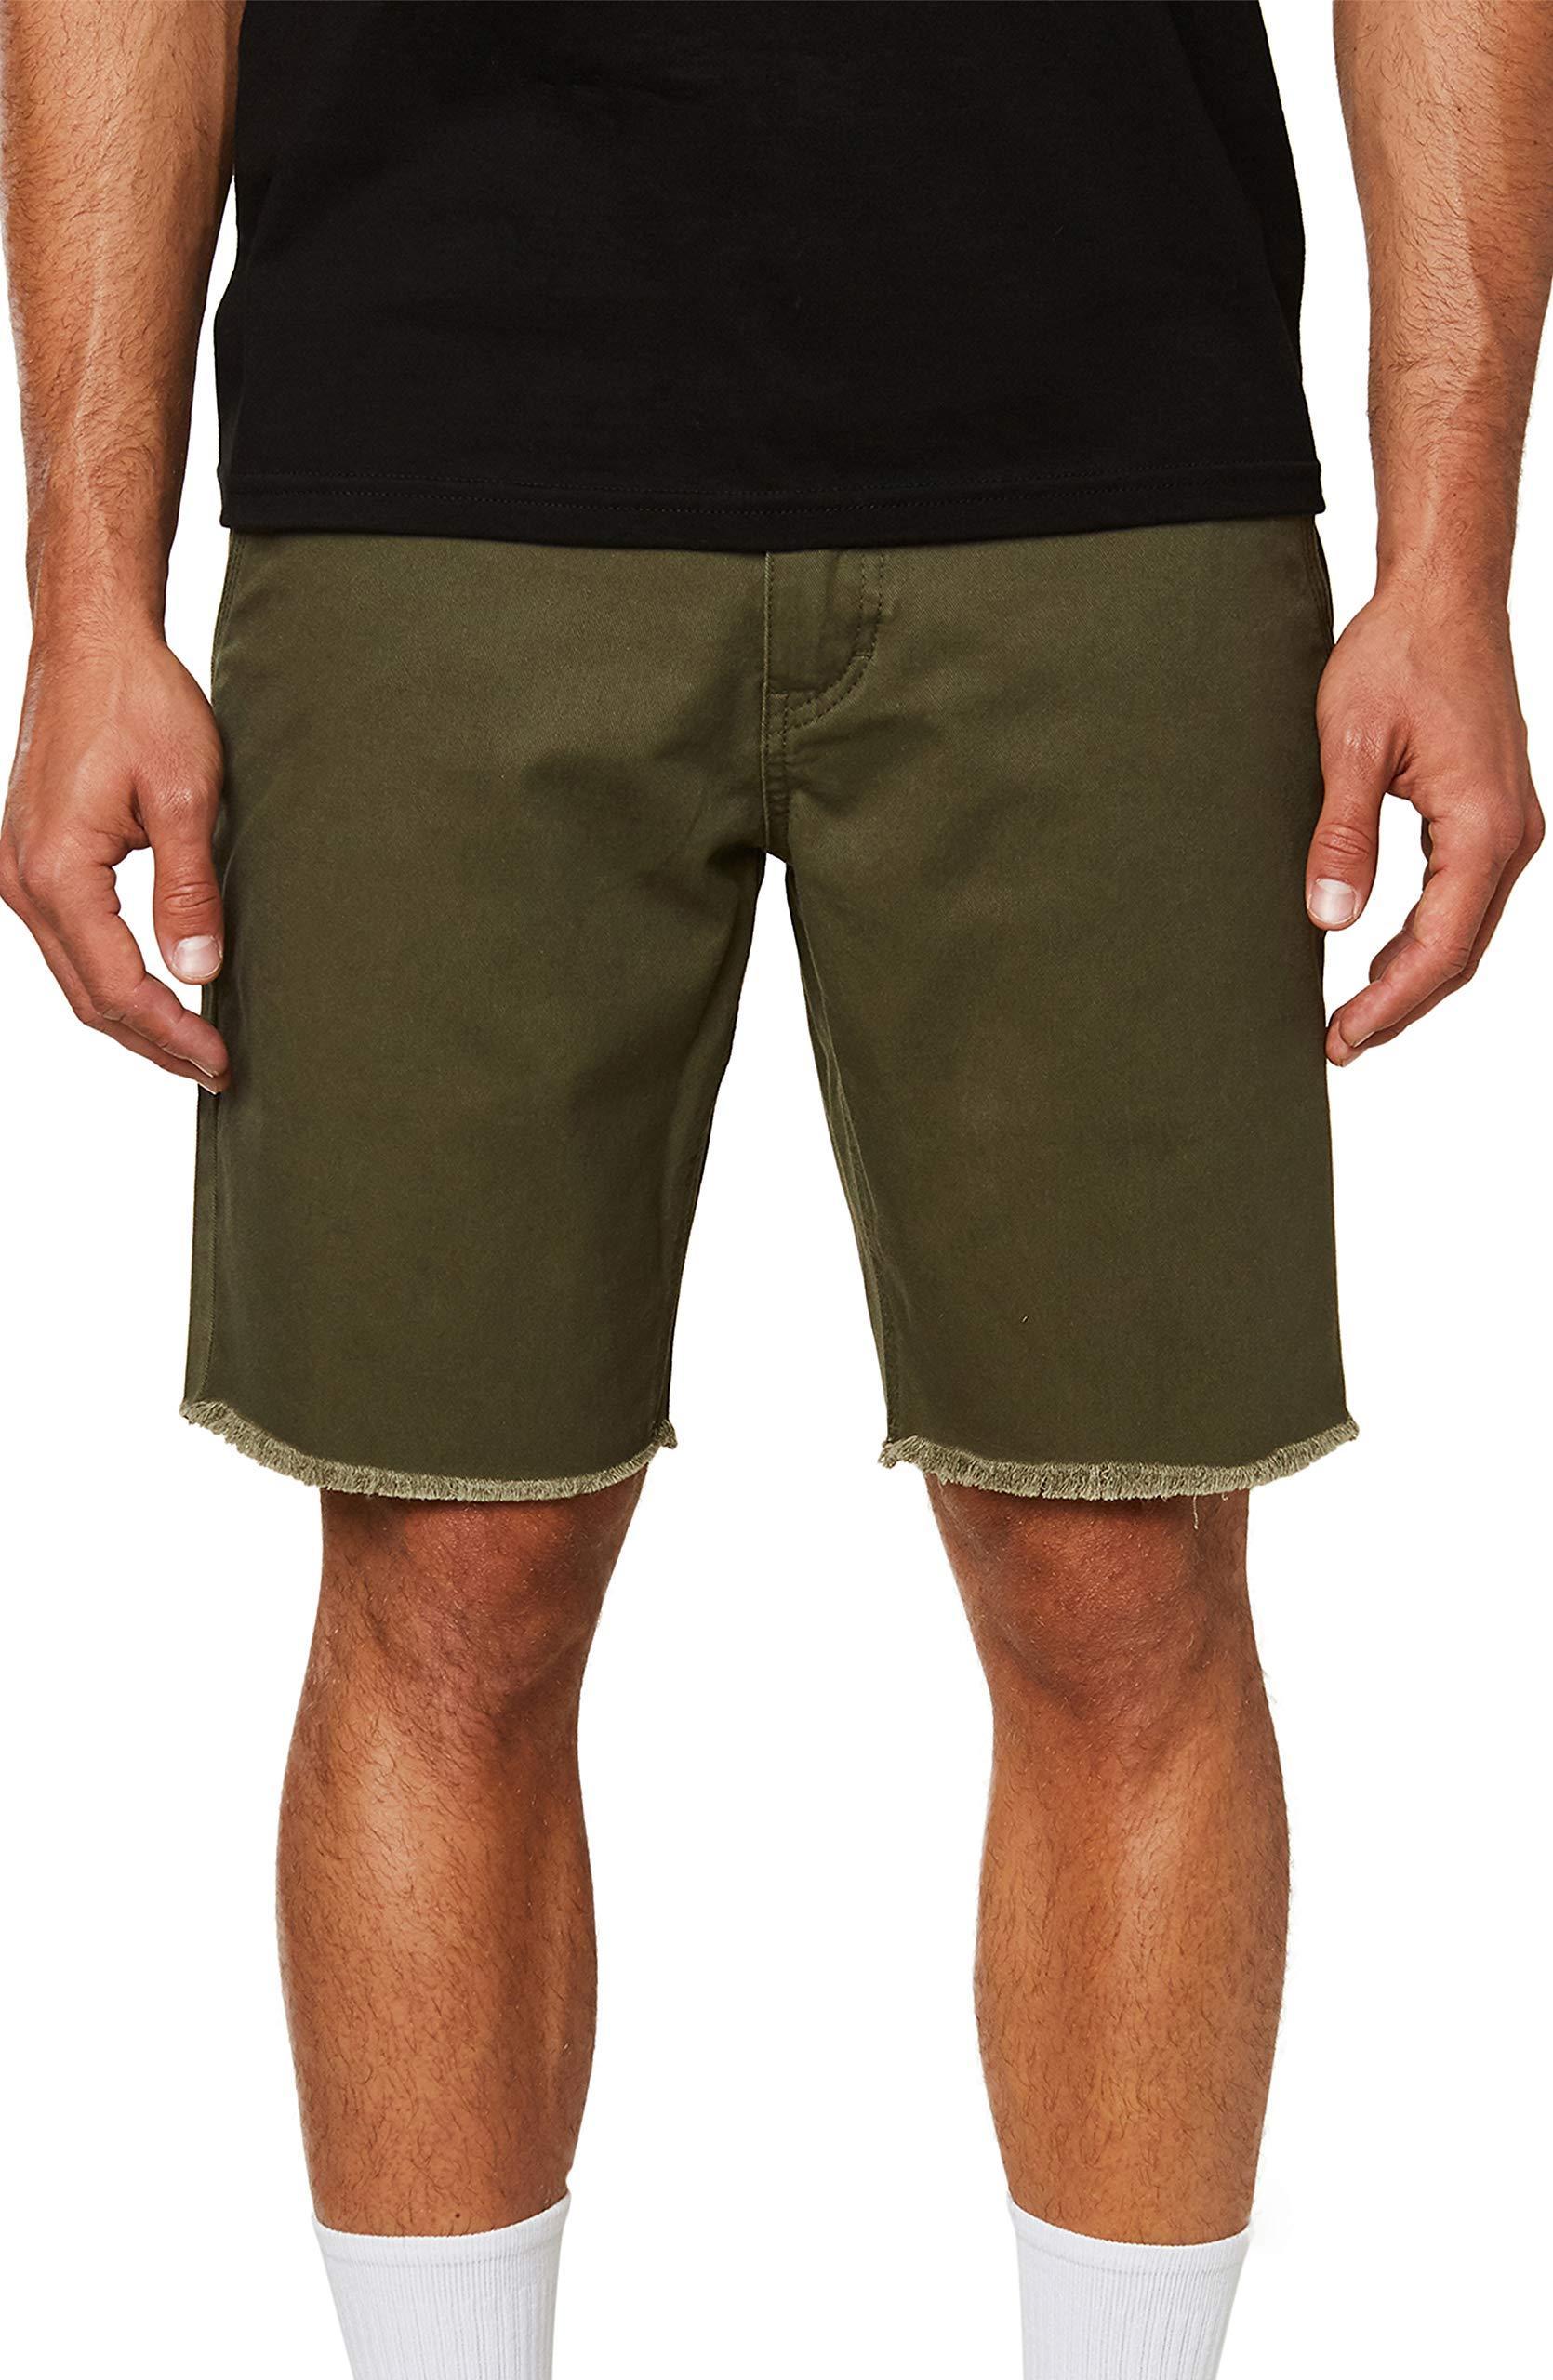 O'Neill Men's Standard Fit Walk Short, 19 Inch Outseam